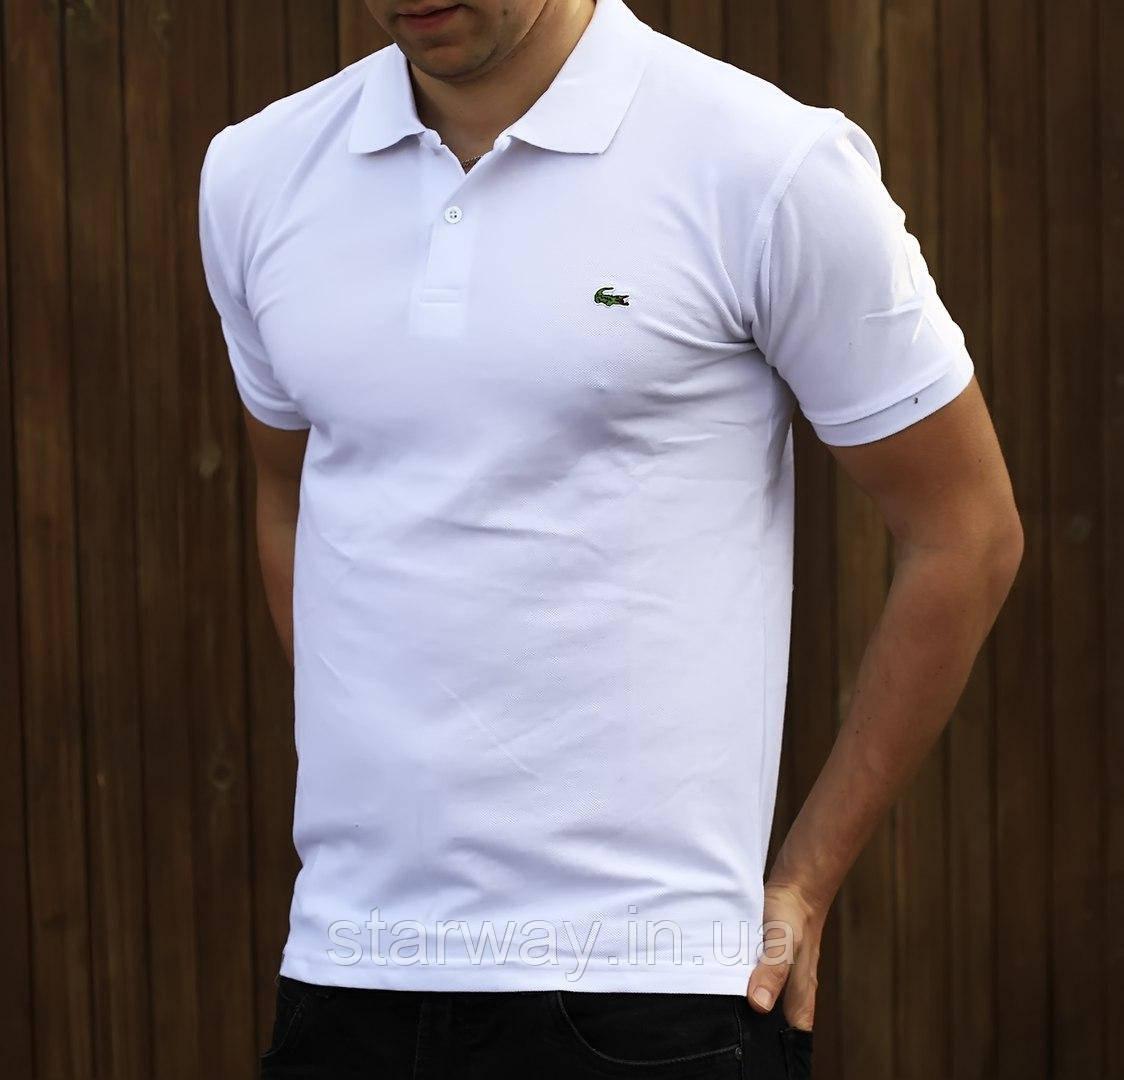 Футболка поло | белая тенниска Lacoste логотип вышивка | бирка